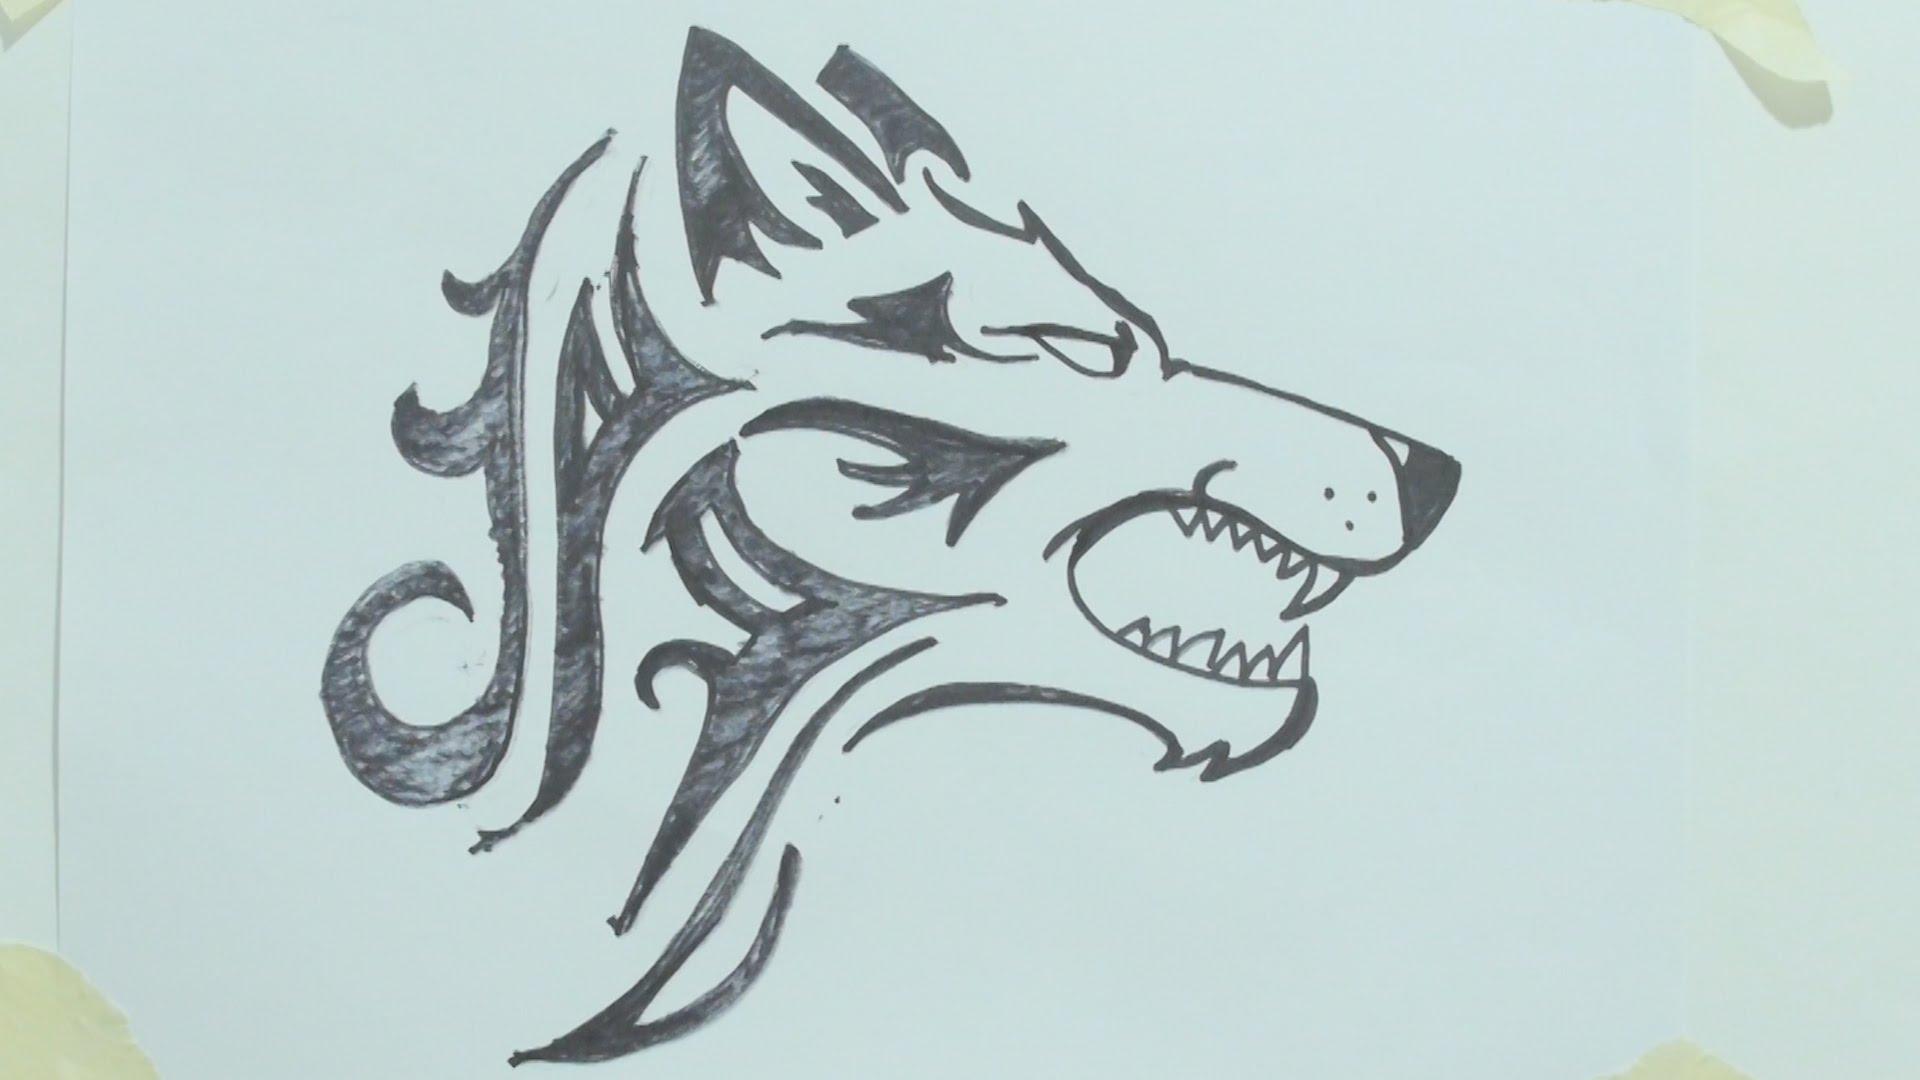 1920x1080 How To Draw A Tribal Wolf Head Tattoo